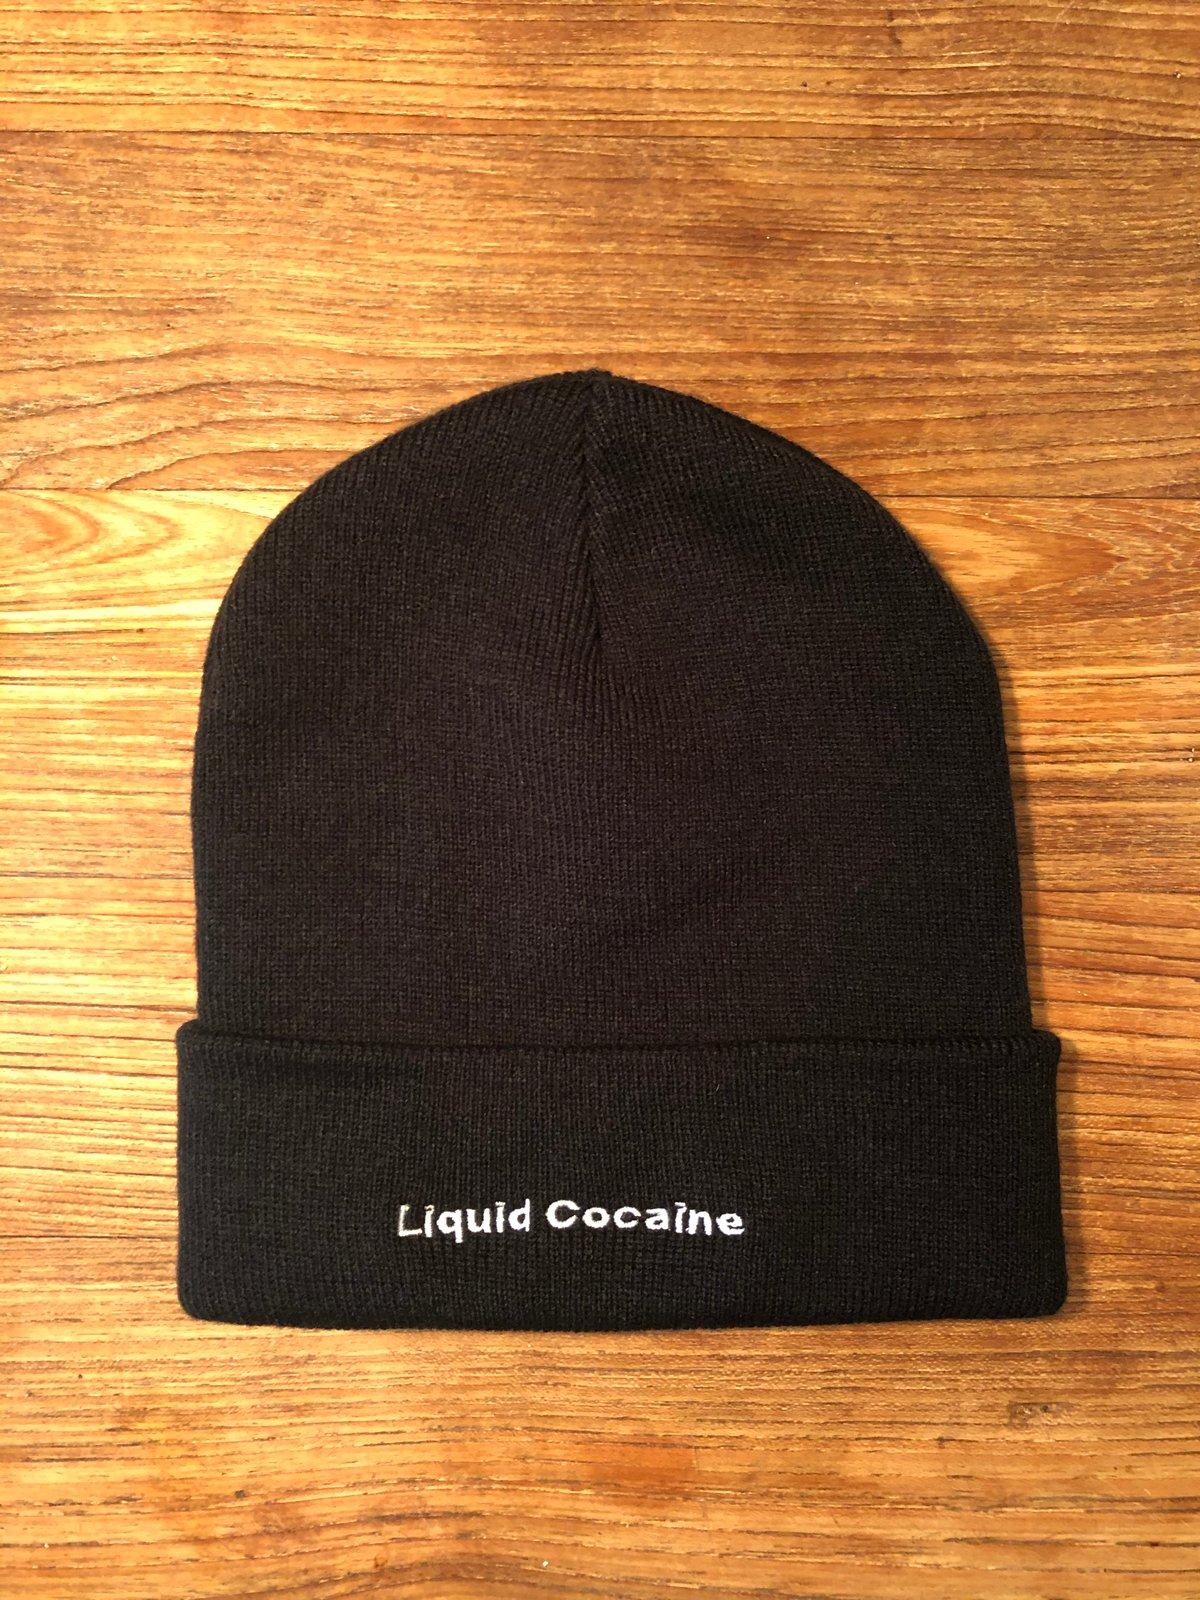 Image of Liquid Cocaine Beanie